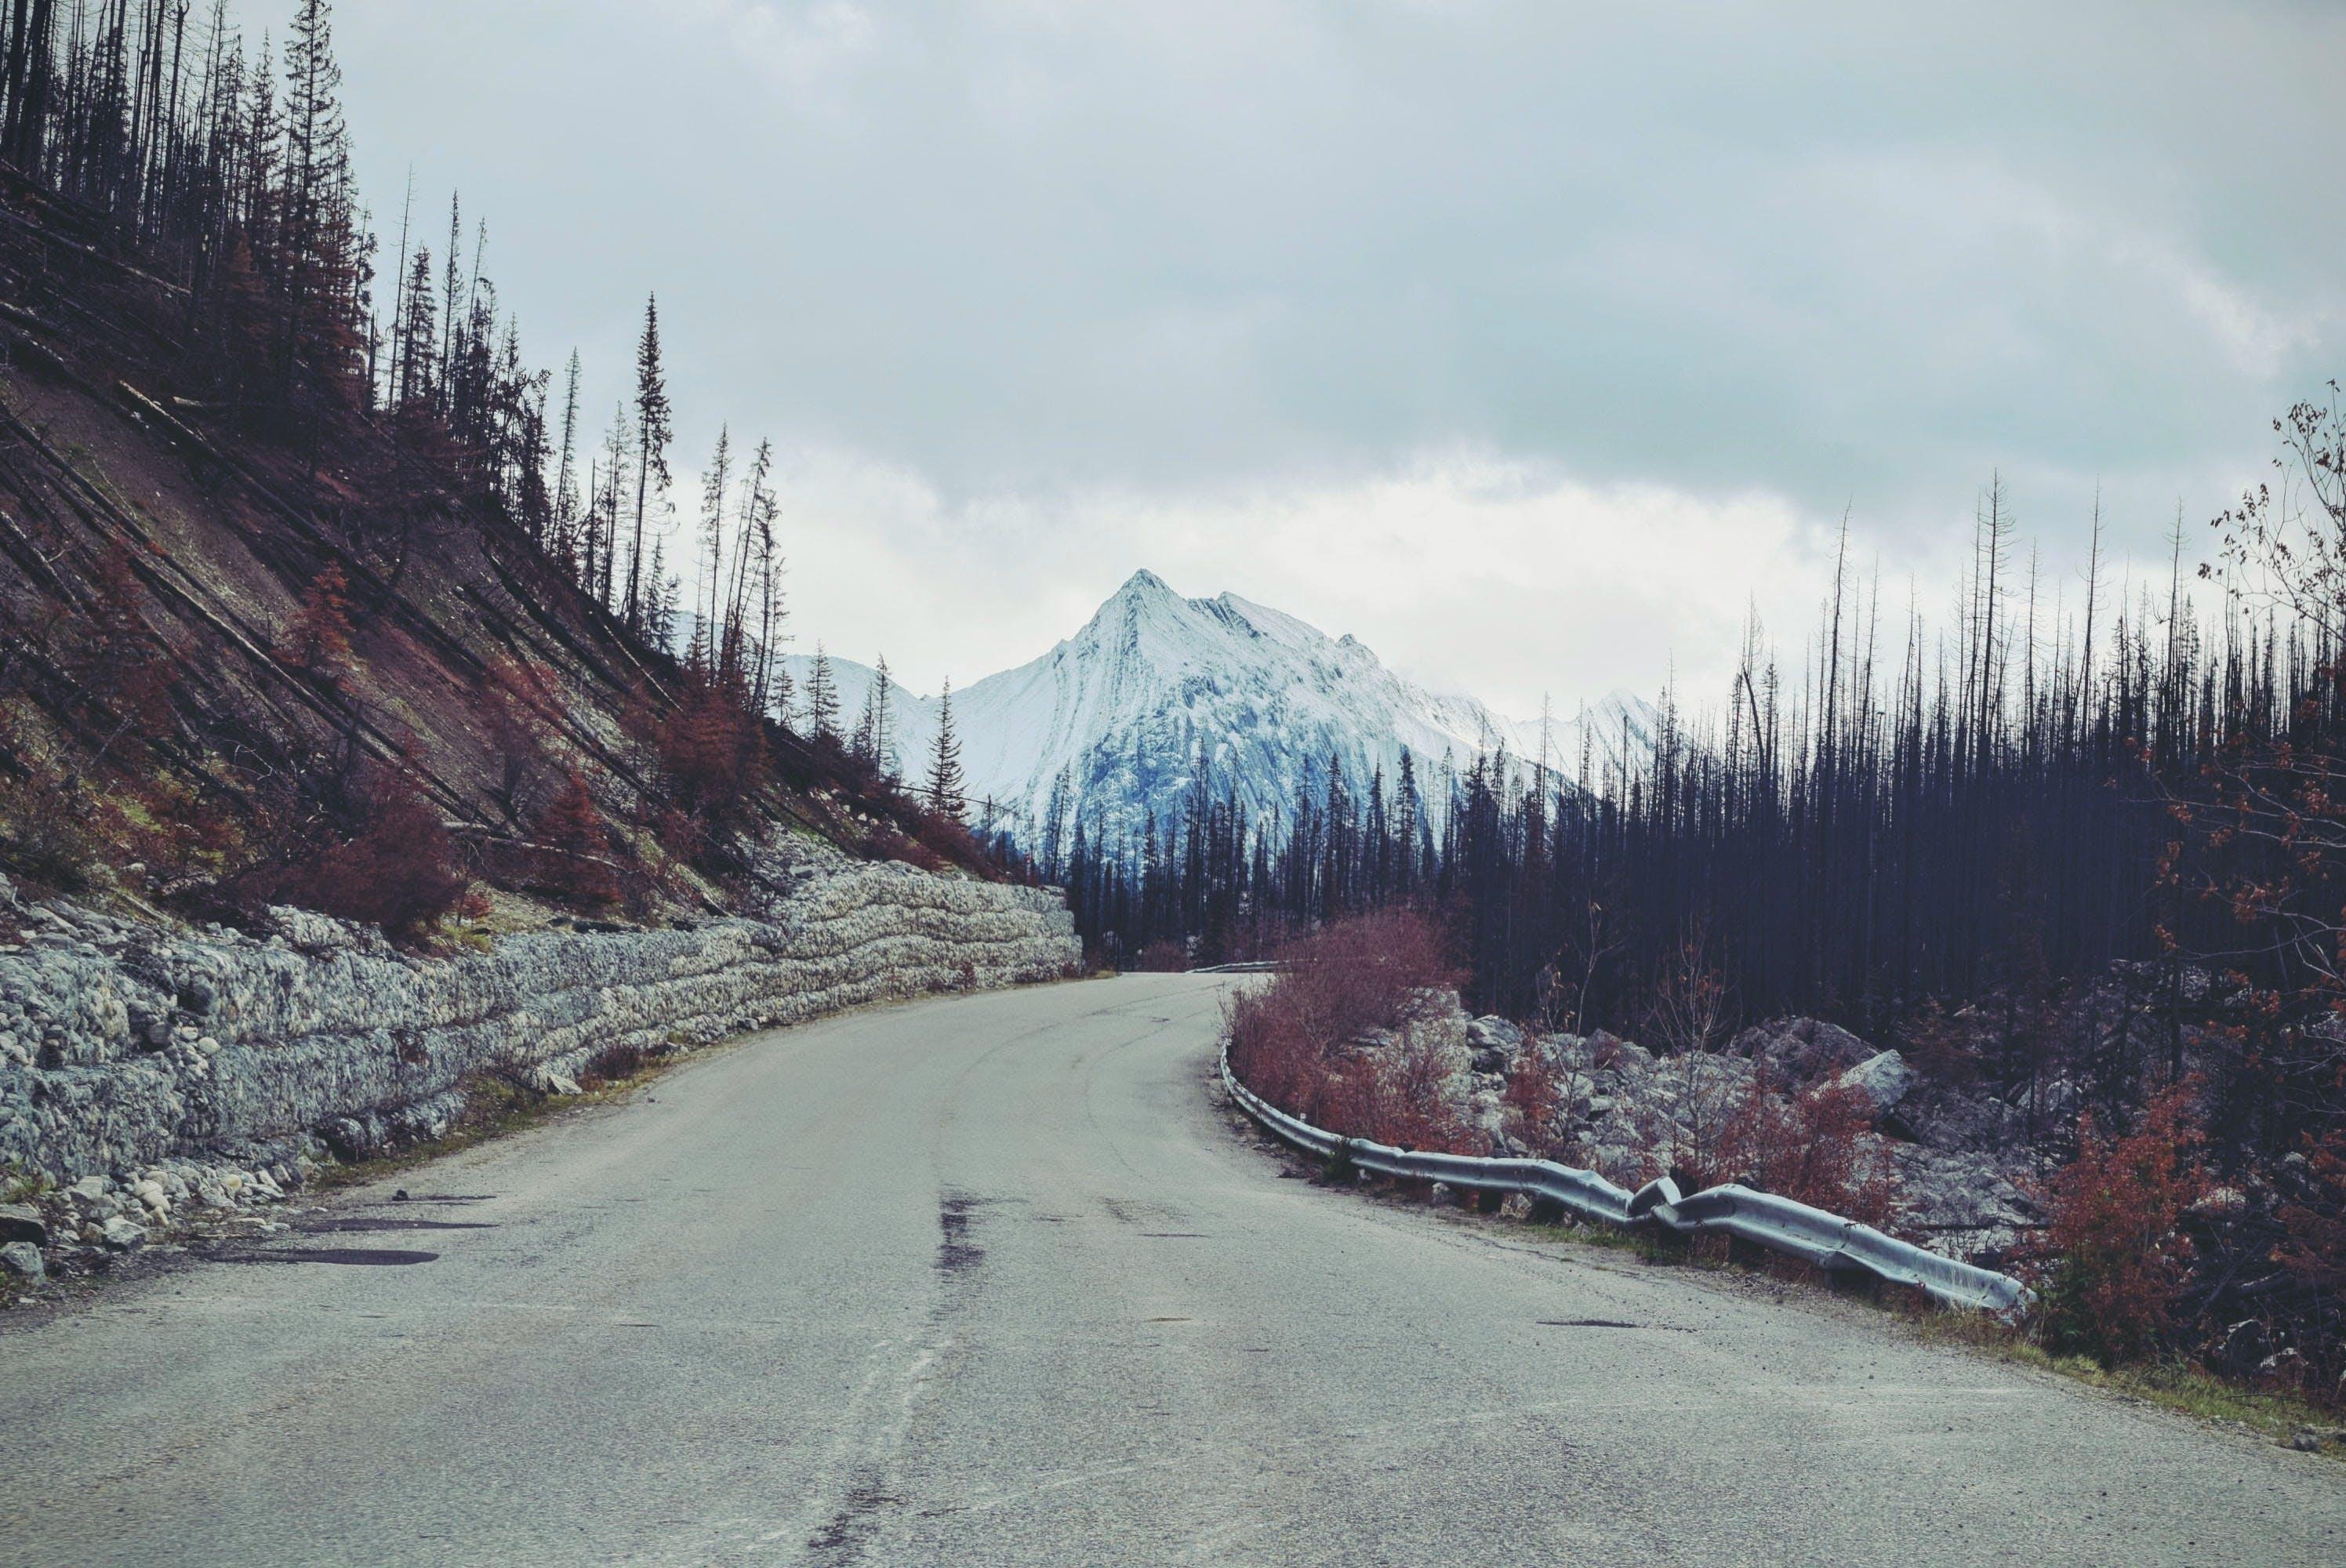 Empty Pave Road Towards Snow Mountain